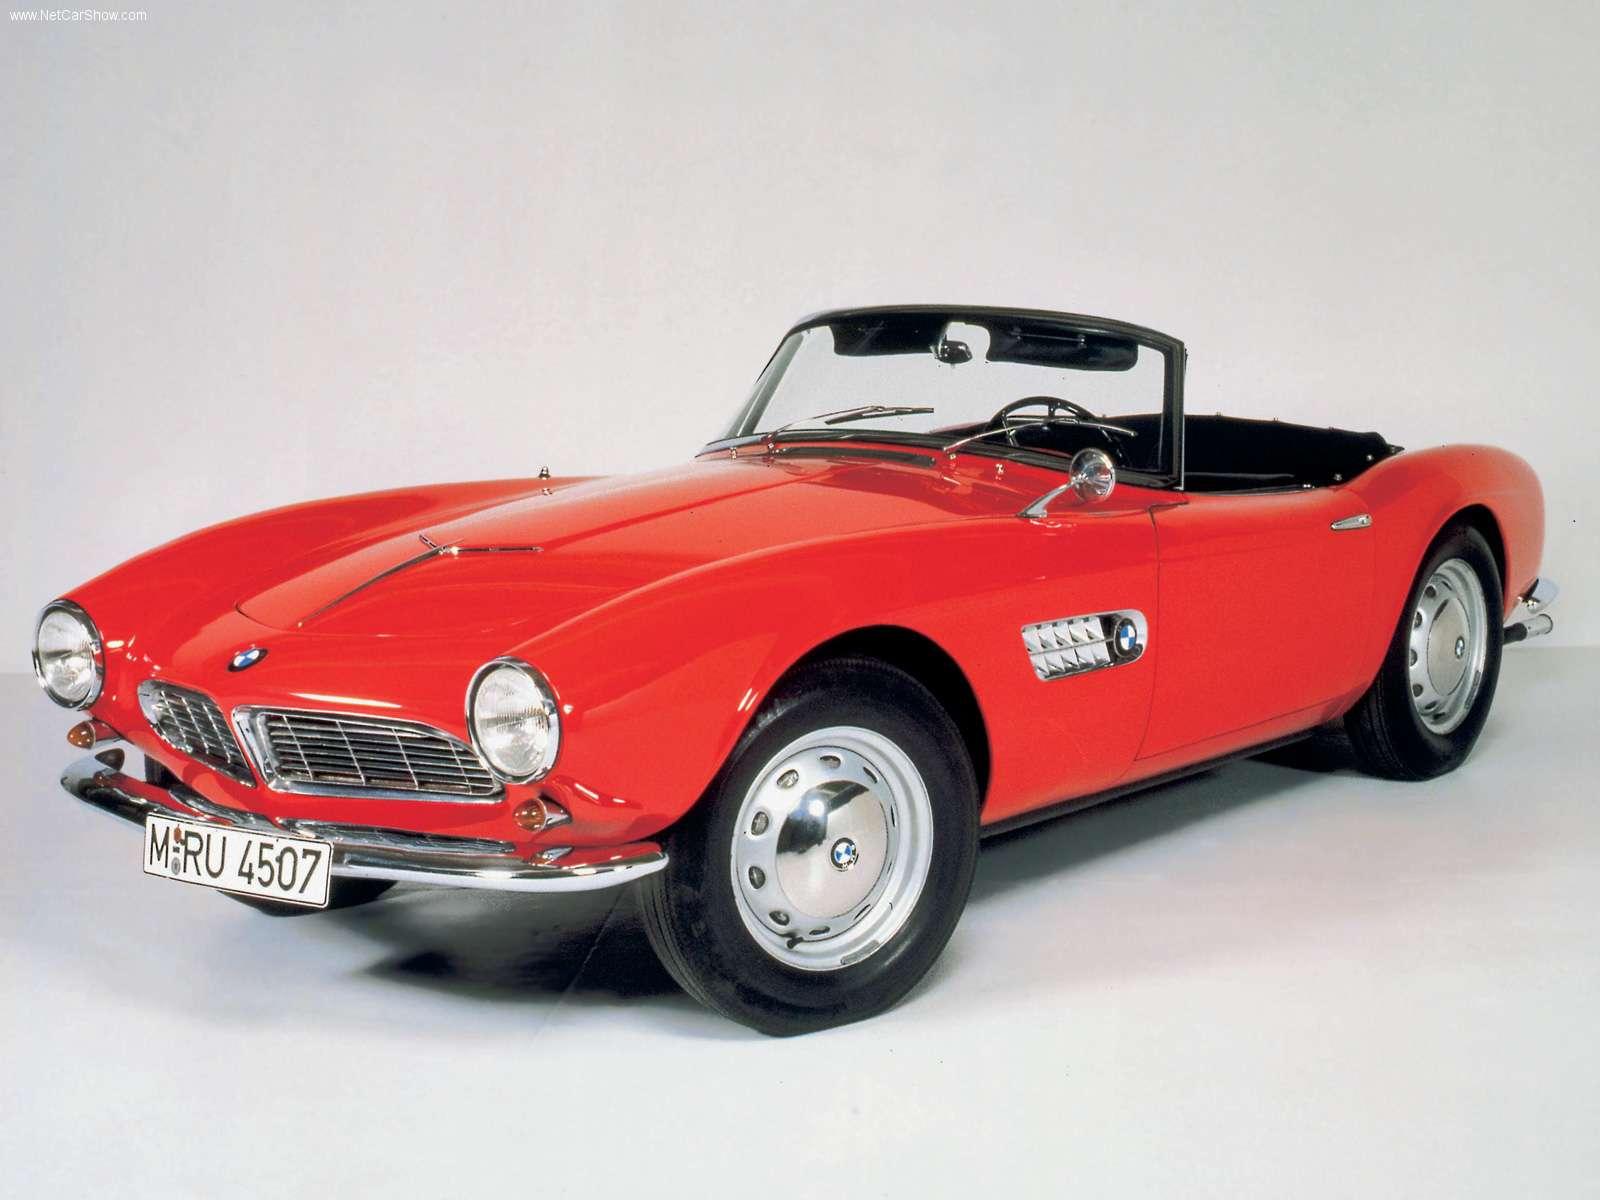 bmw-507-1955-1600-05